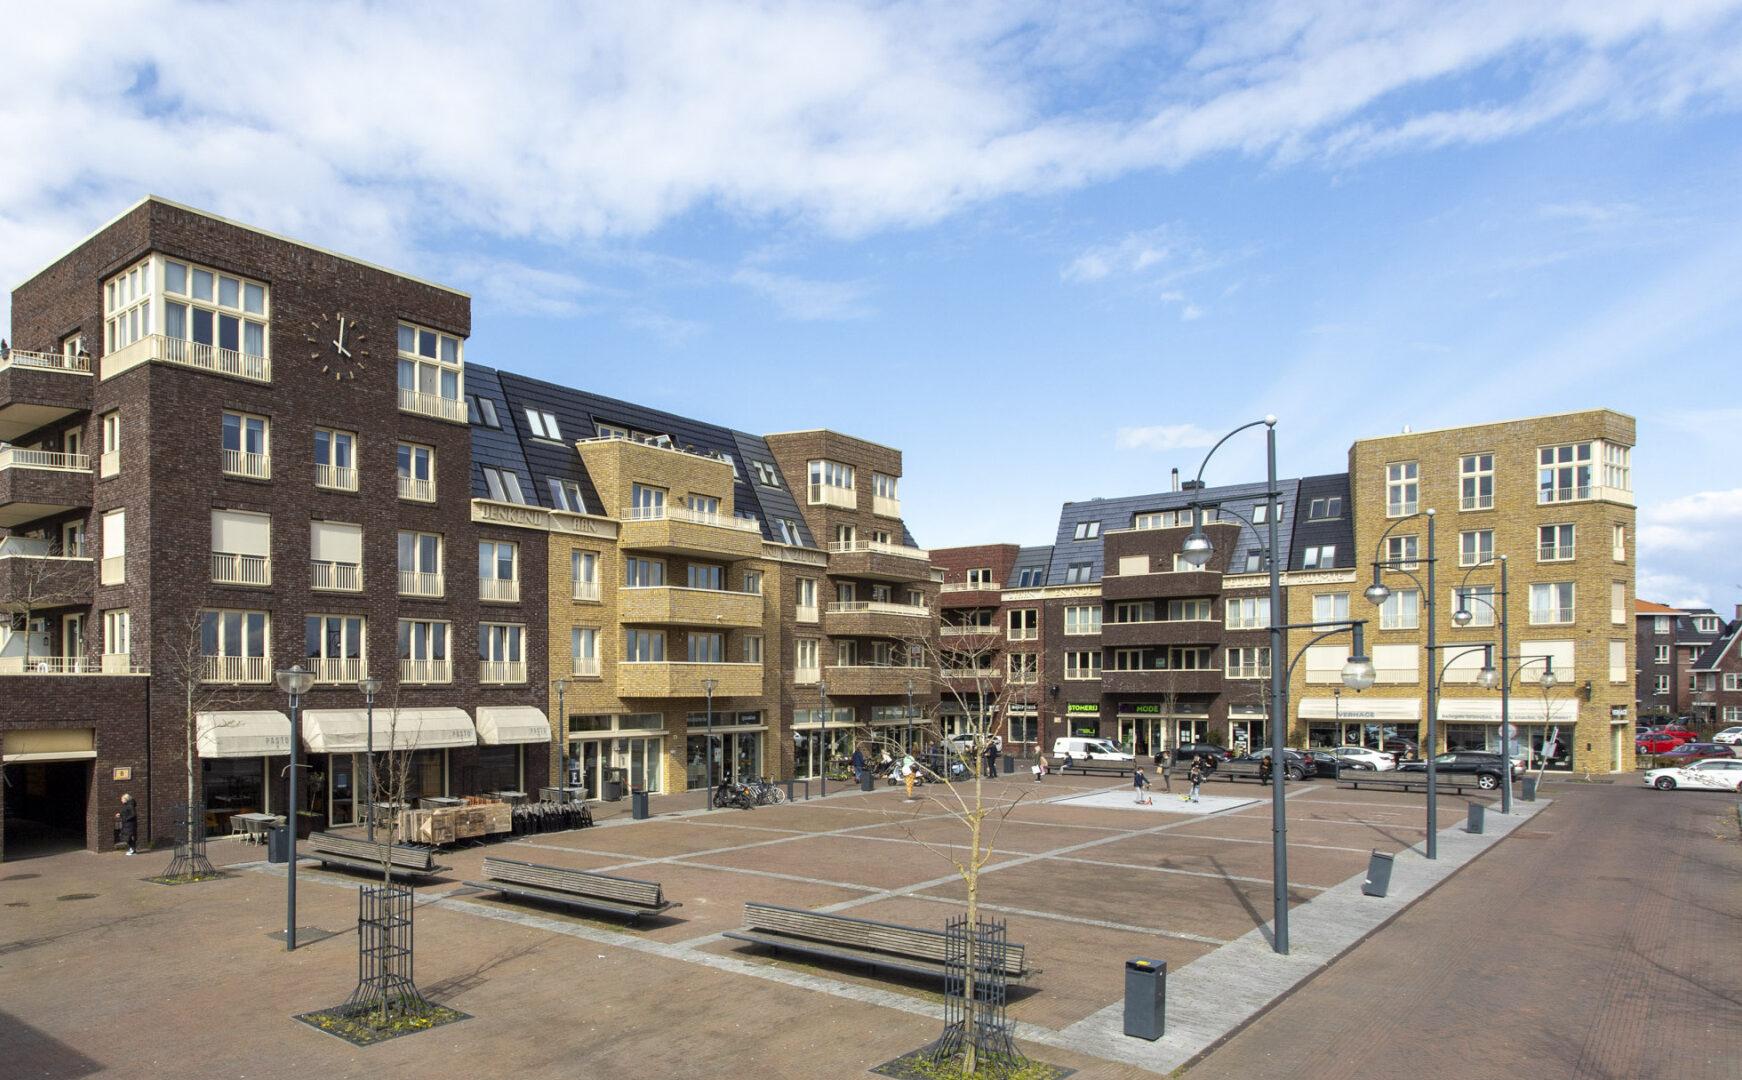 westpolderplein-startpunt-loopgroep-berkel